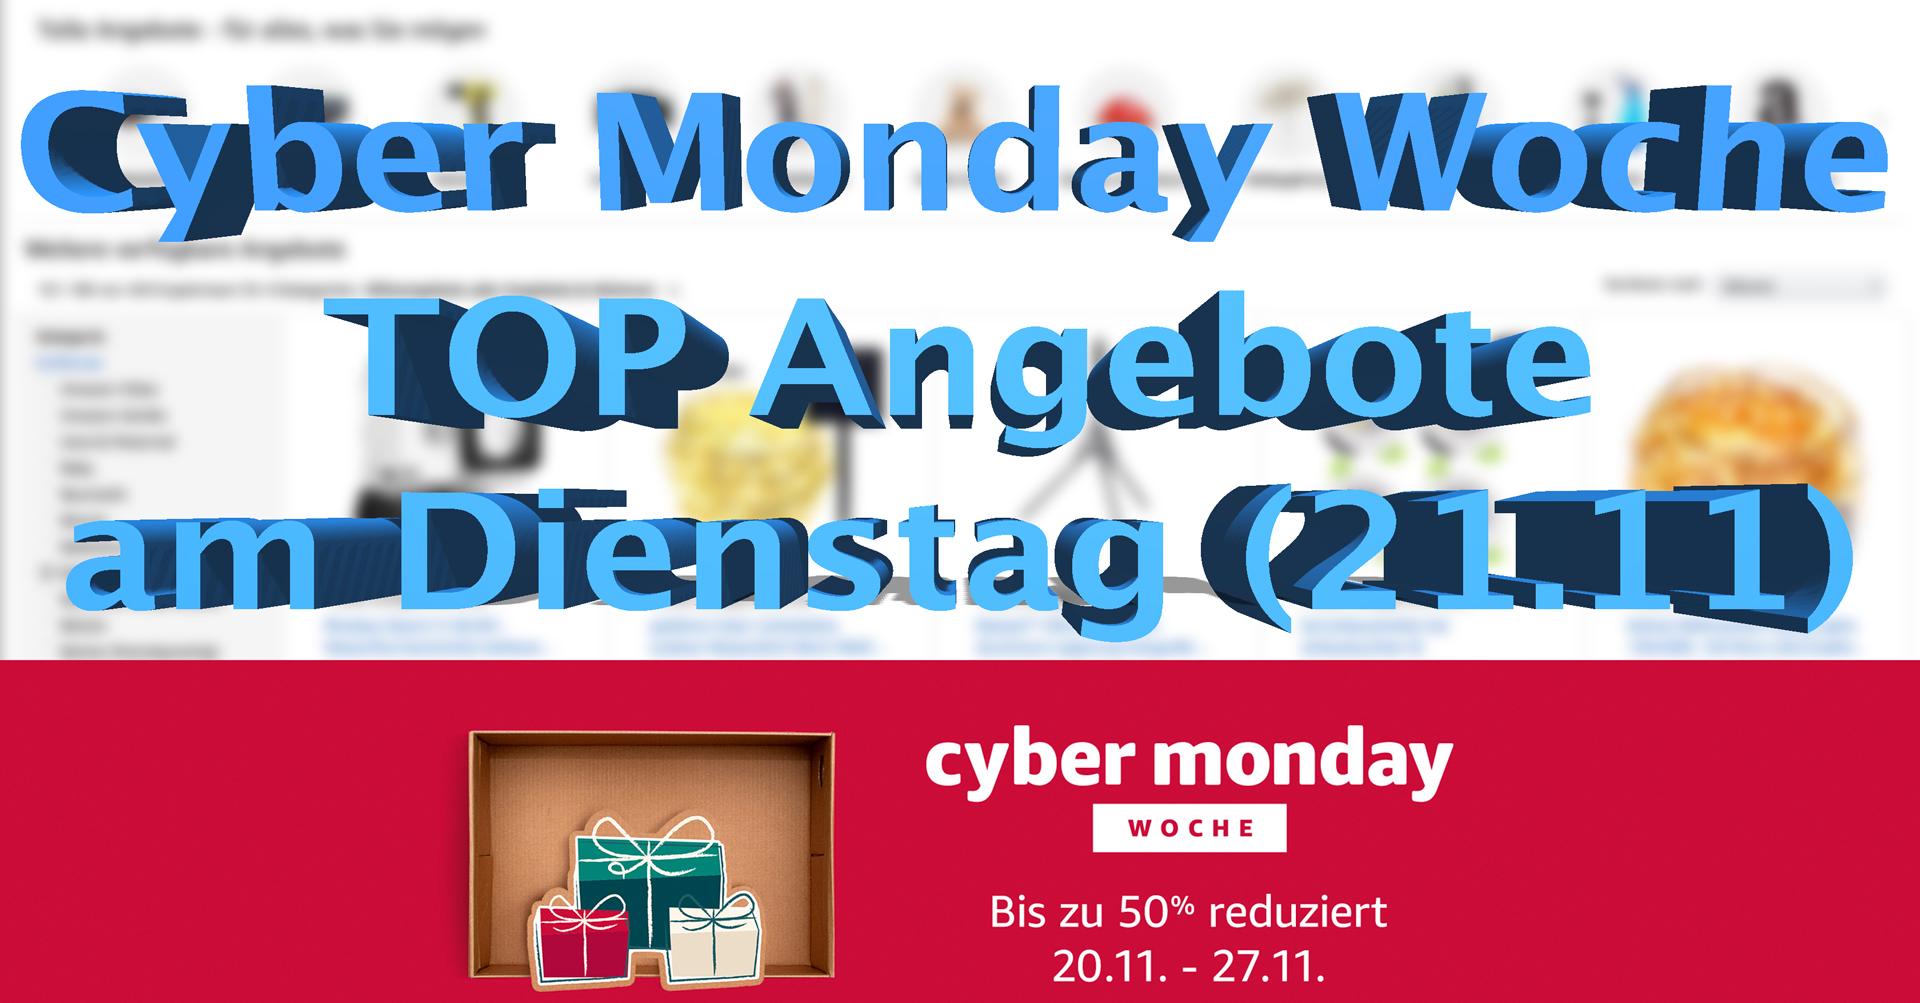 Cyber Monday Woche: Top Angebote am Dienstag - Hack4Life